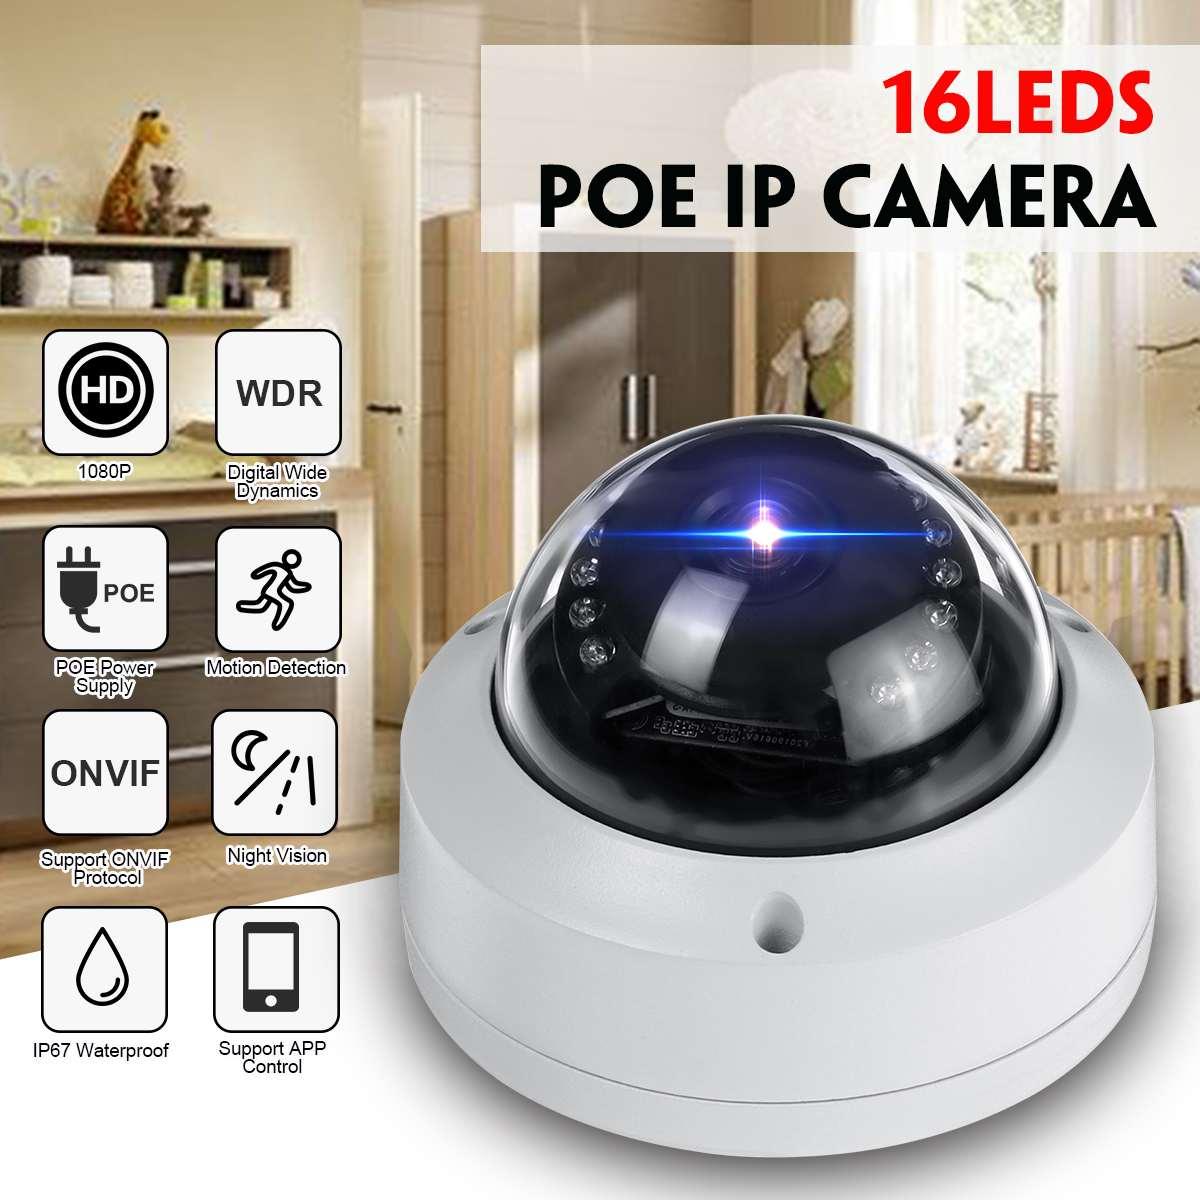 16LEDs 1080P Wifi Camera IP Camera 2MP IR 30M Night Vision Outdoor Indoor Camera wifi home security ONVIF POE